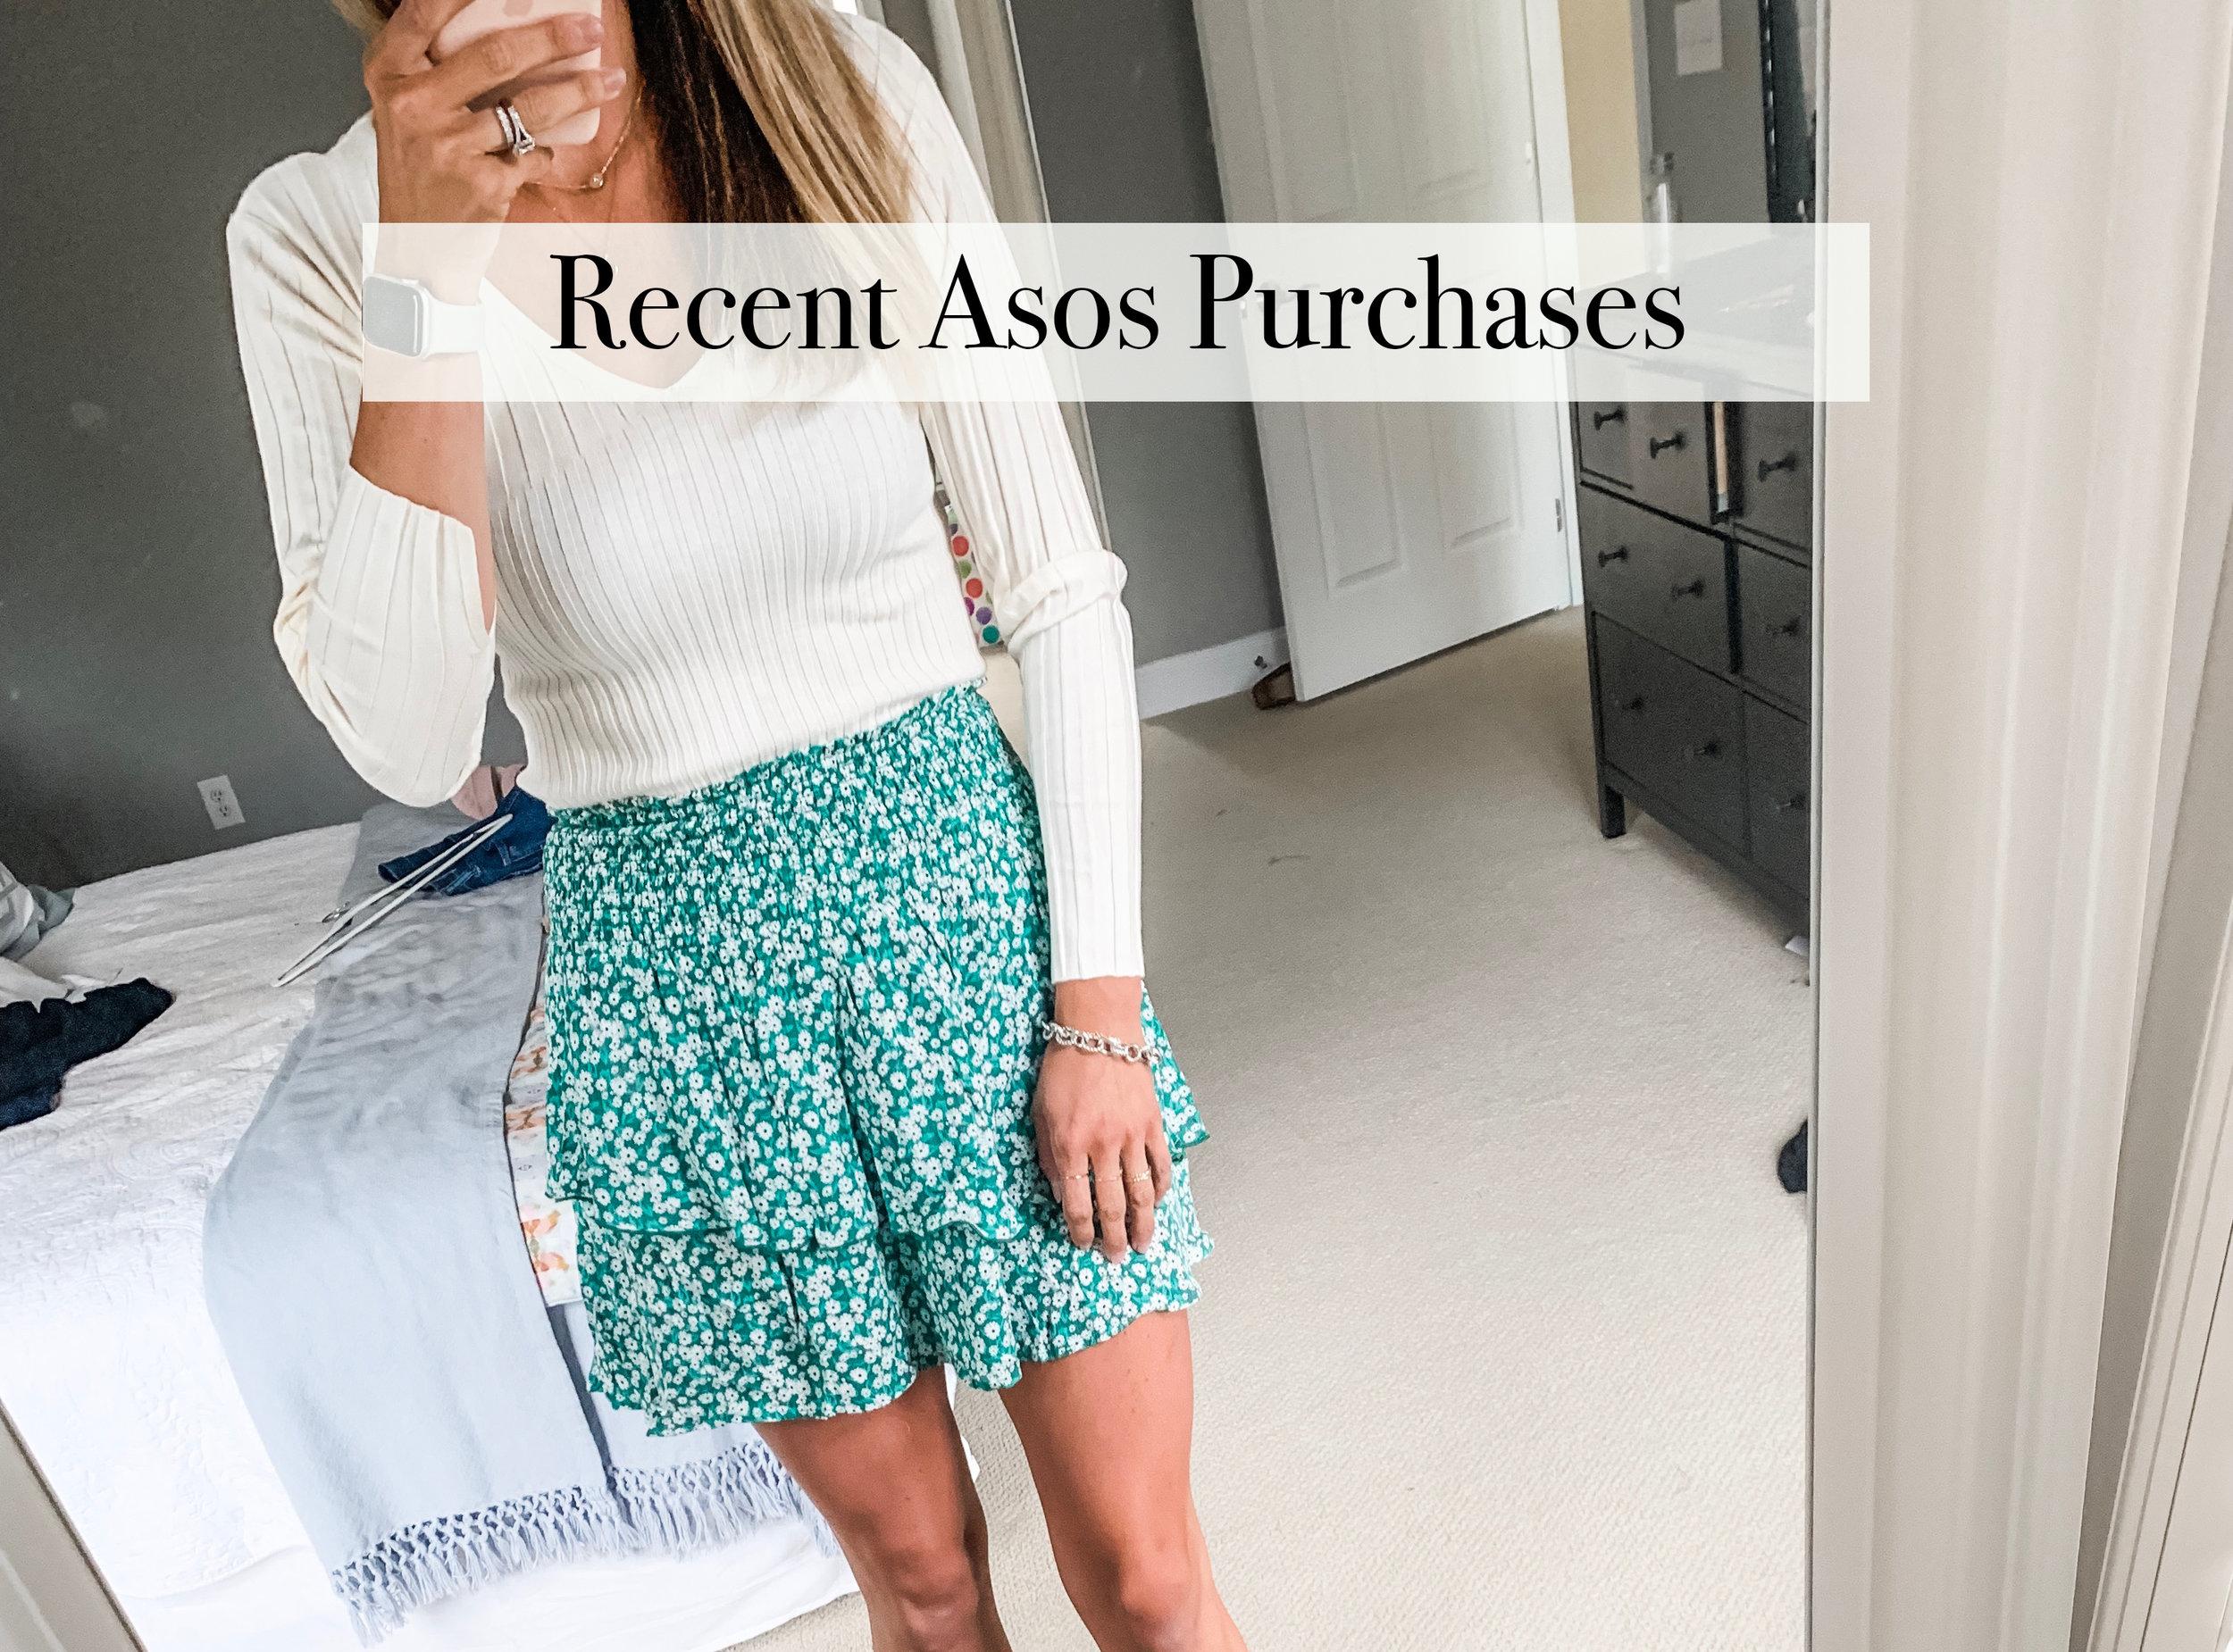 asos purchases.jpg